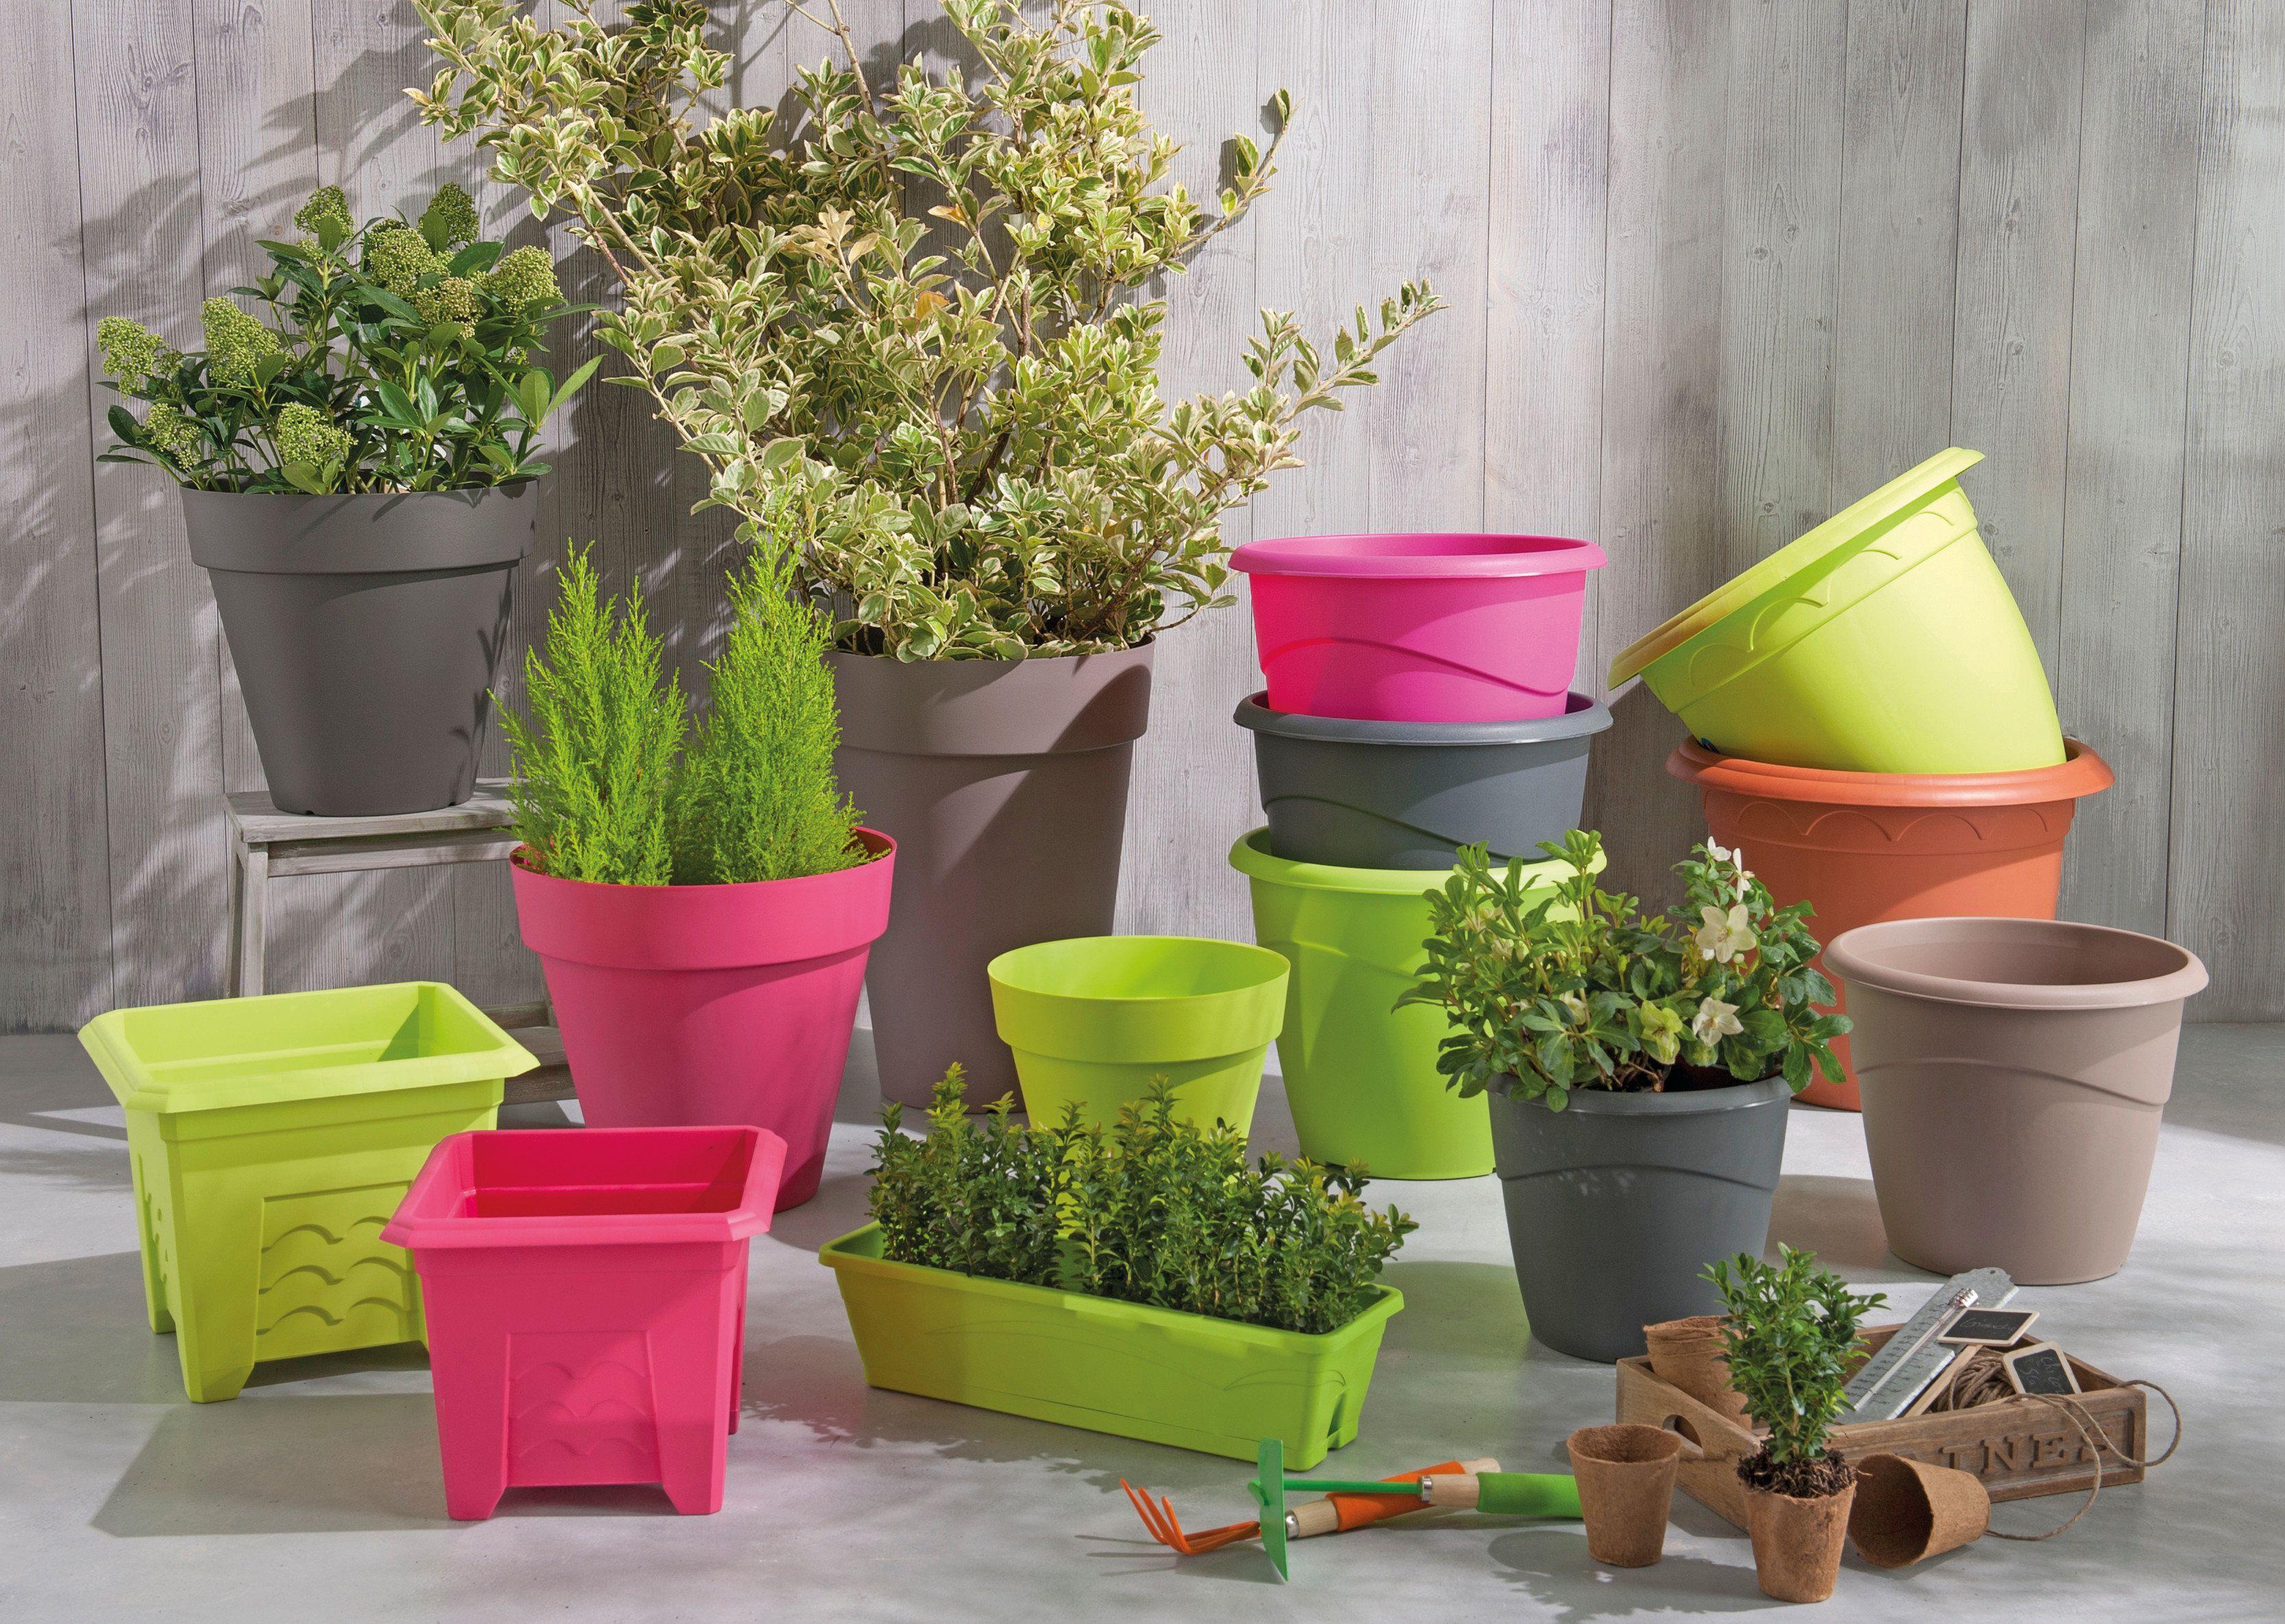 DIY Planter un œuf cru dans un pot de fleurs Oeuf cru